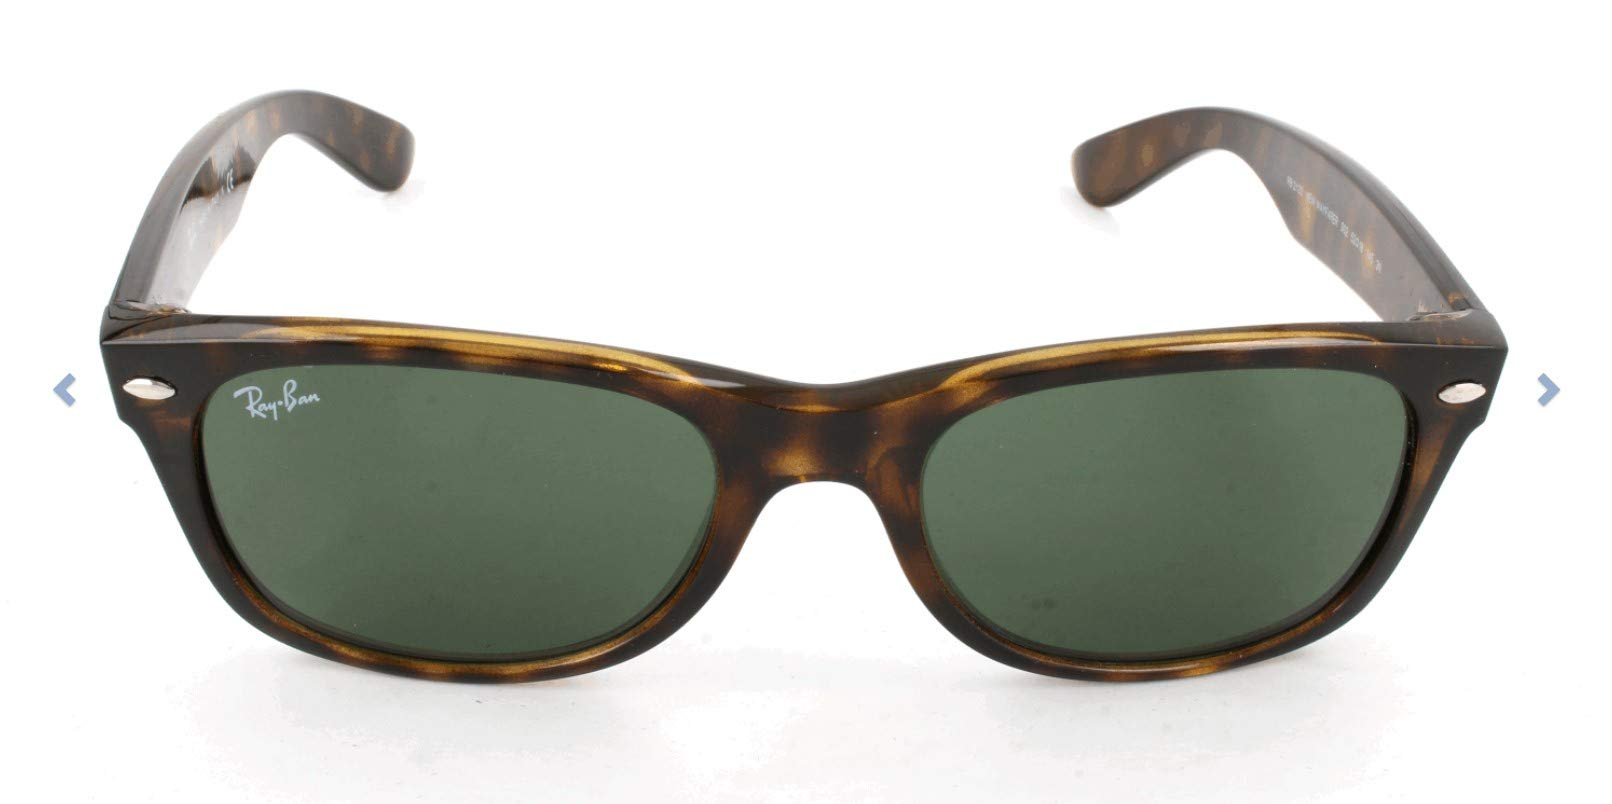 RAY-BAN RB2132 New Wayfarer Polarized Sunglasses, Tortoise/Polarized Green, Polarized Green by Ray-Ban